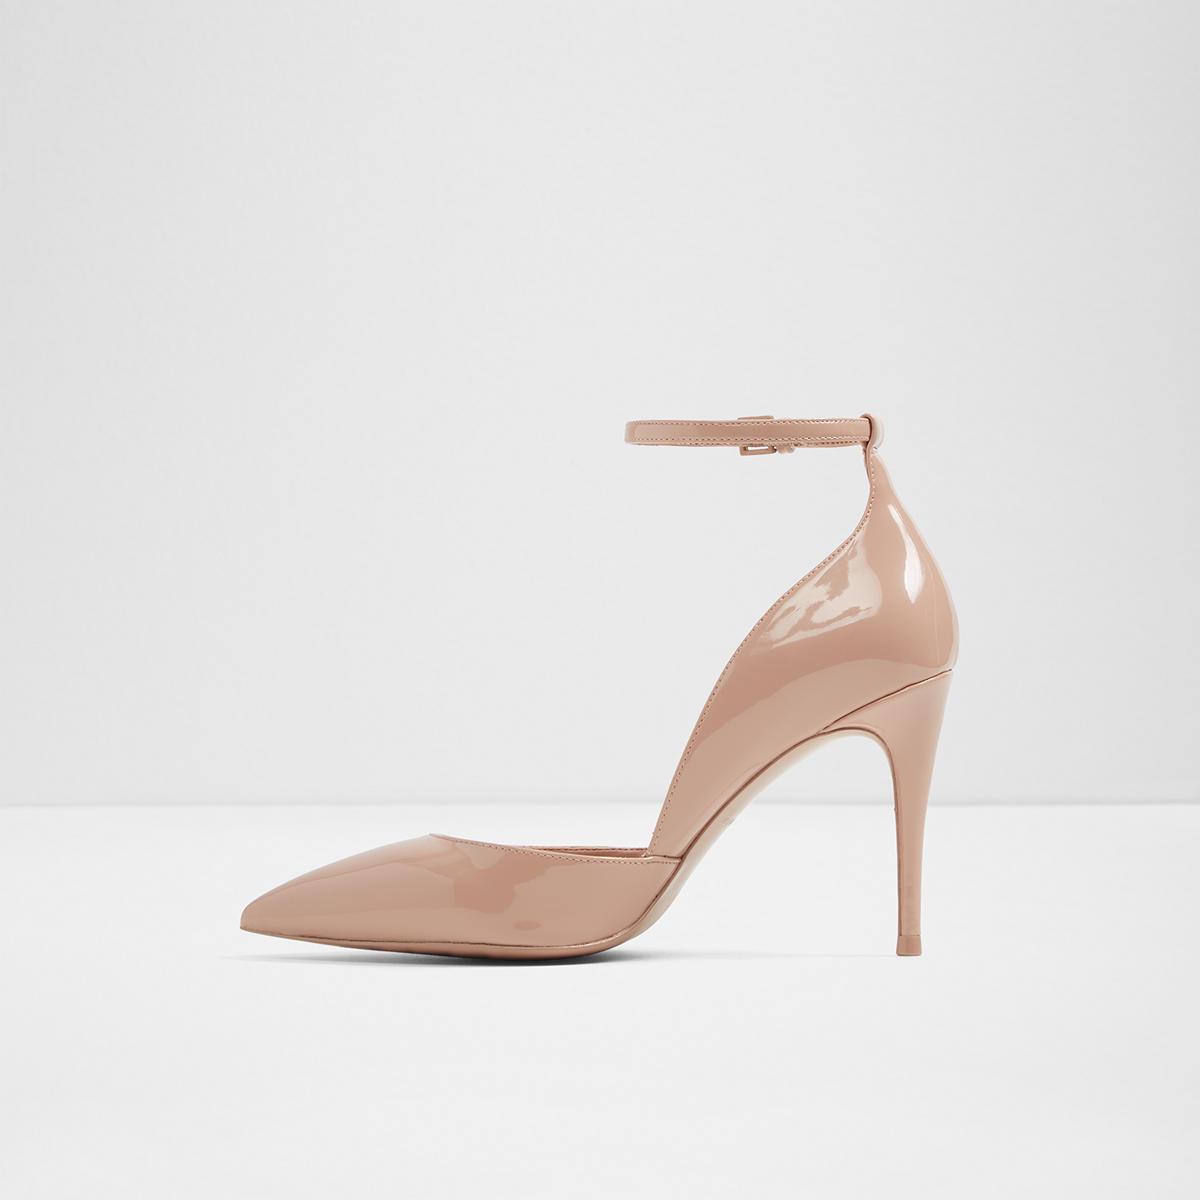 ALDO LAYCEY - High heels - light pink T44fkUP3O